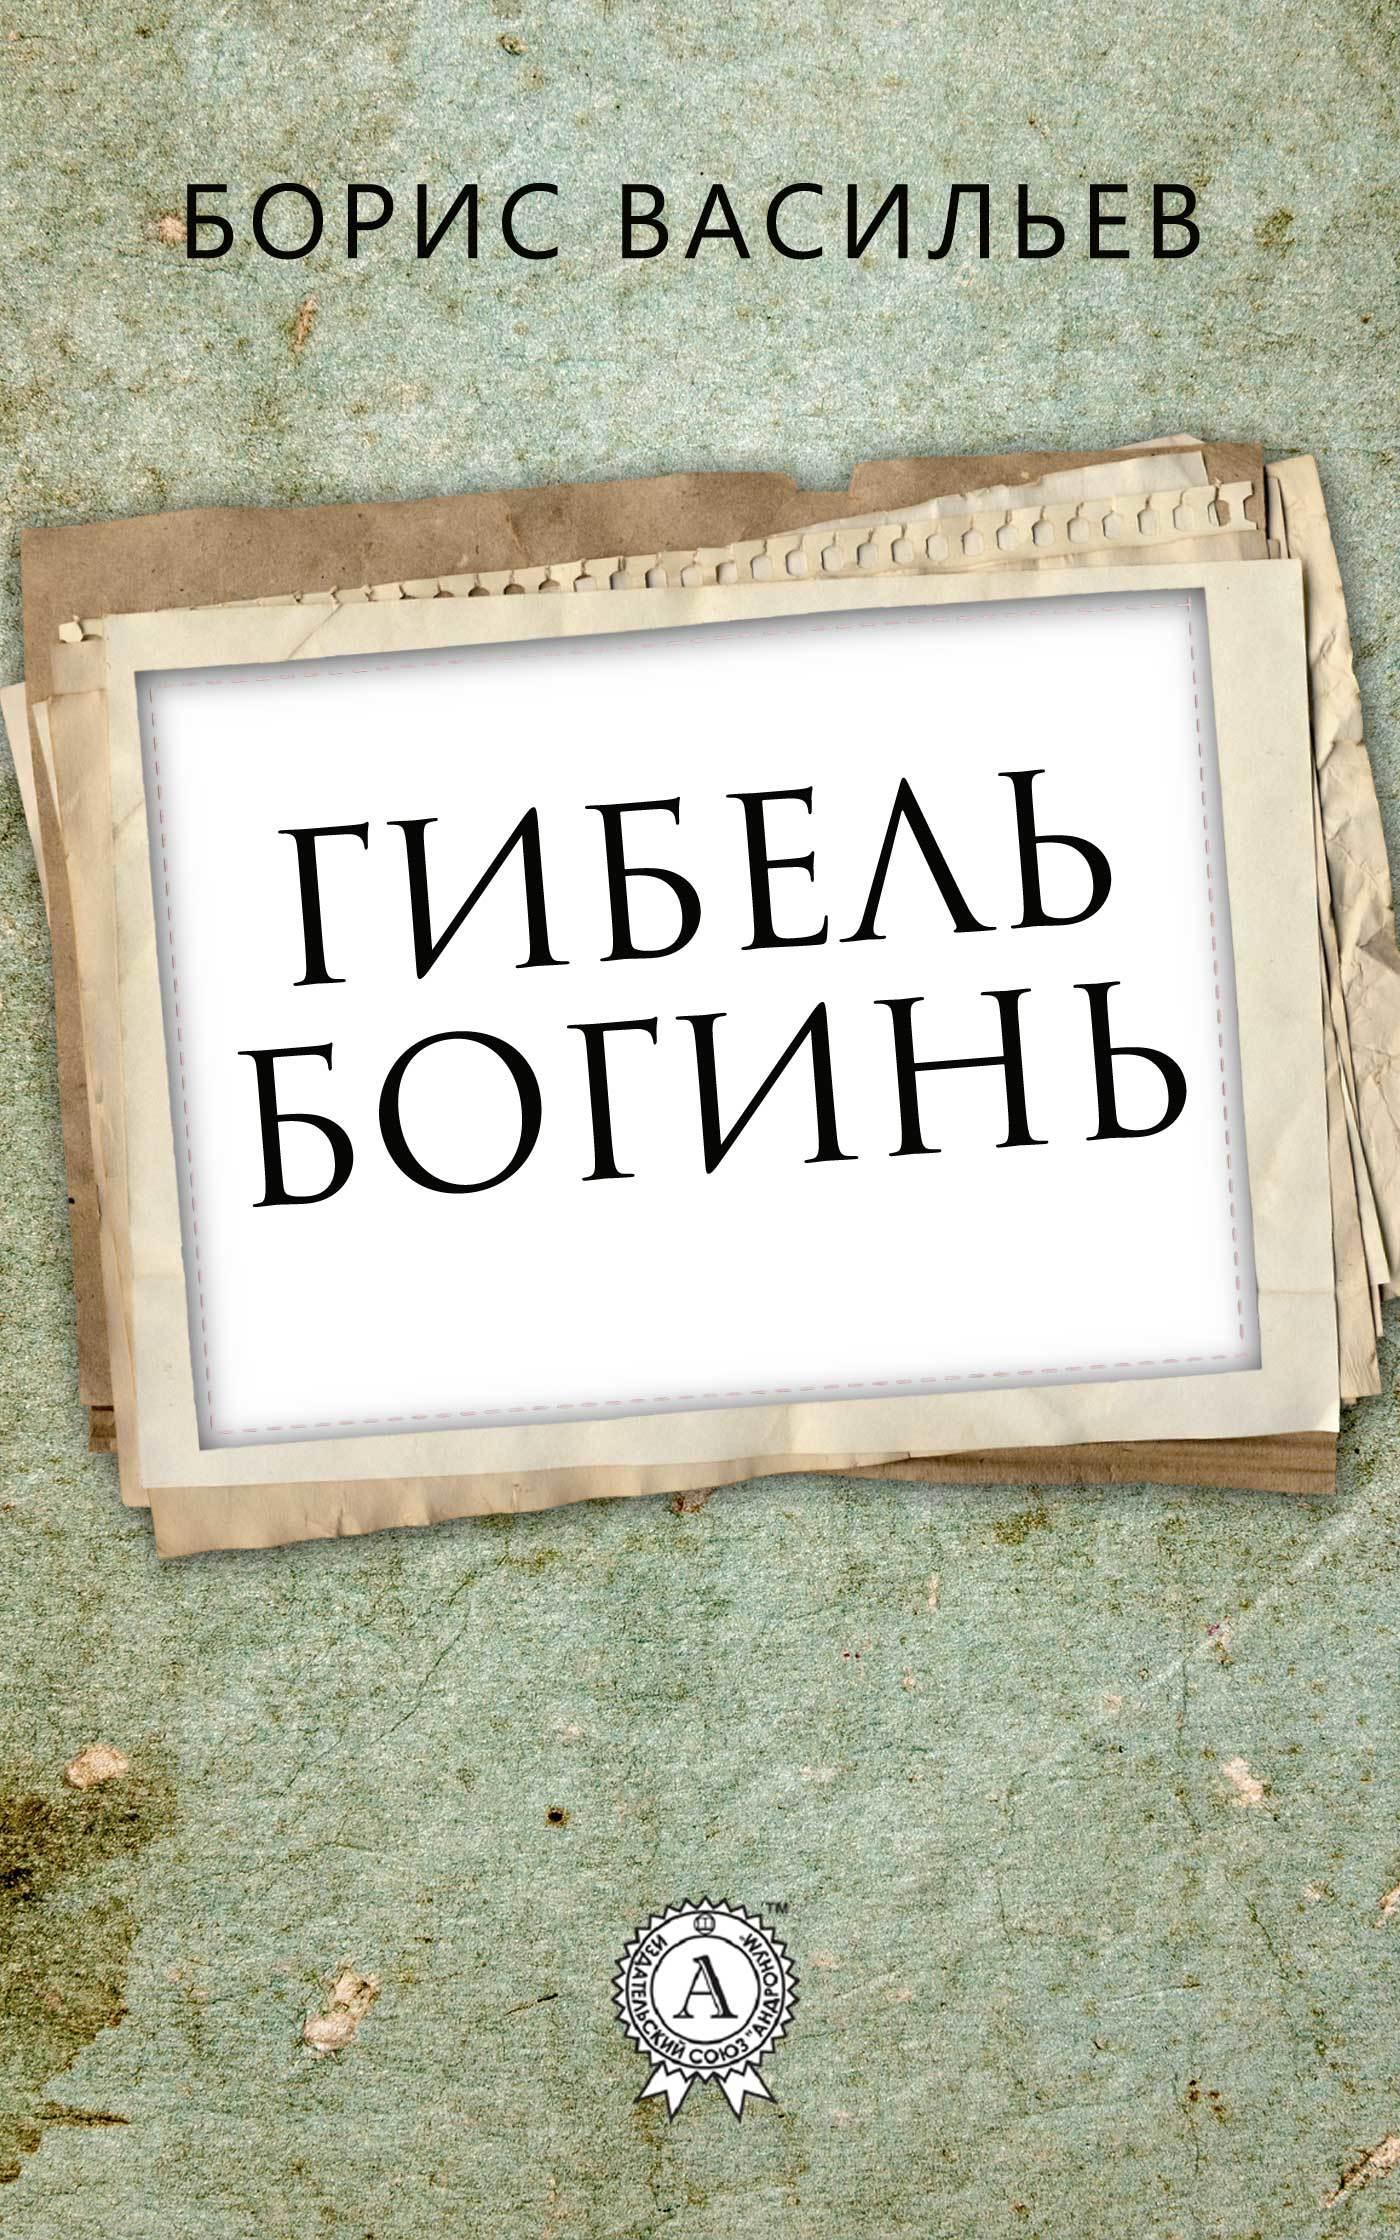 Борис Васильев. Гибель богинь